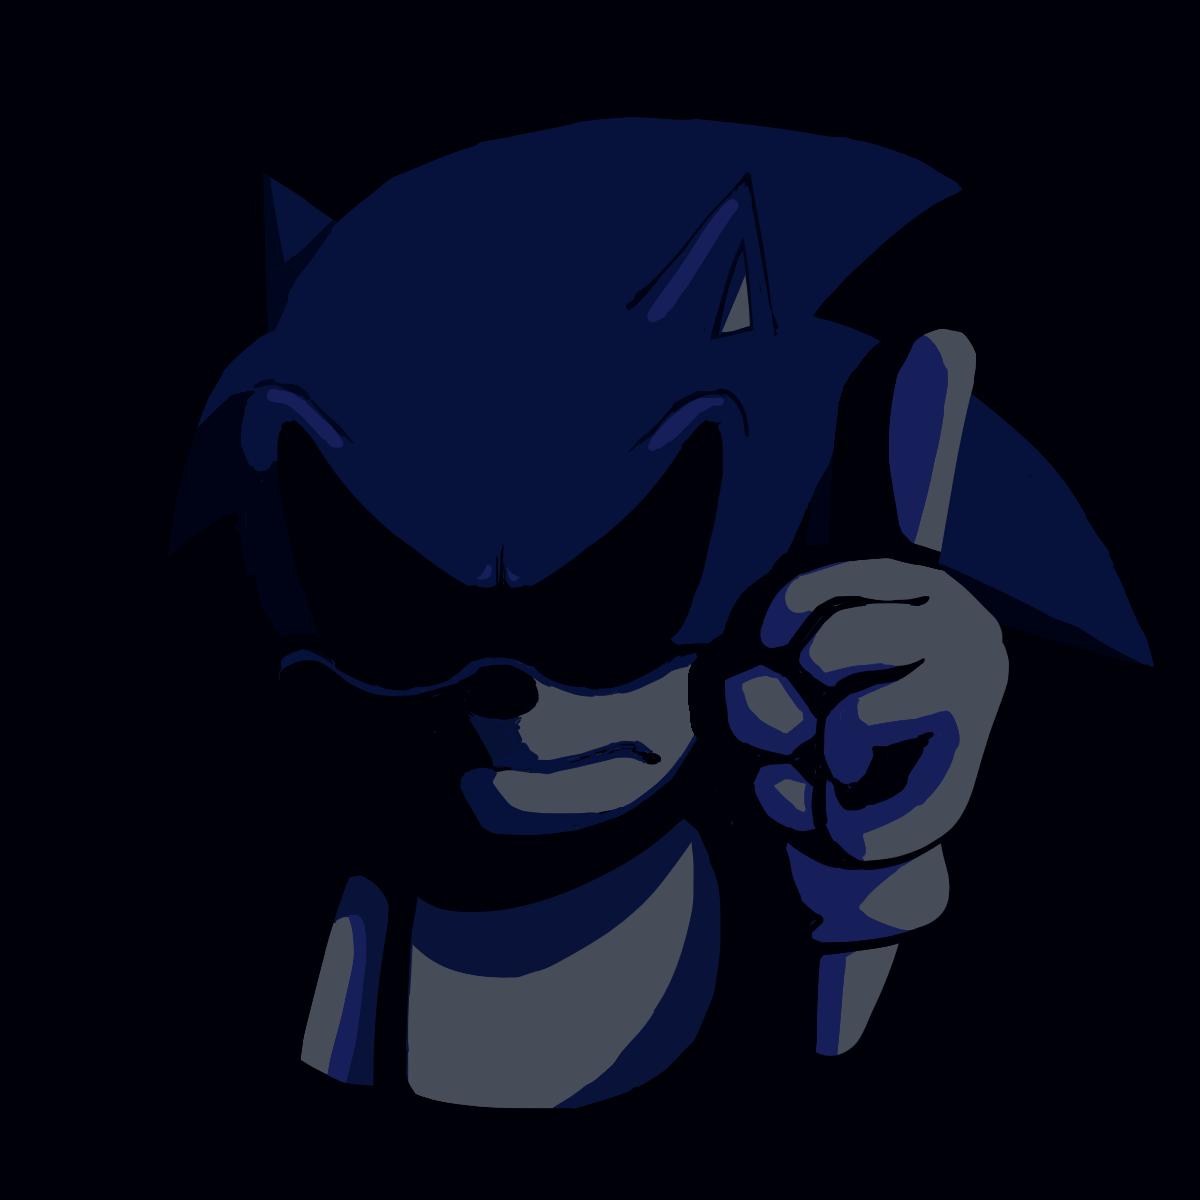 sonic the slightly menacing hedgehog